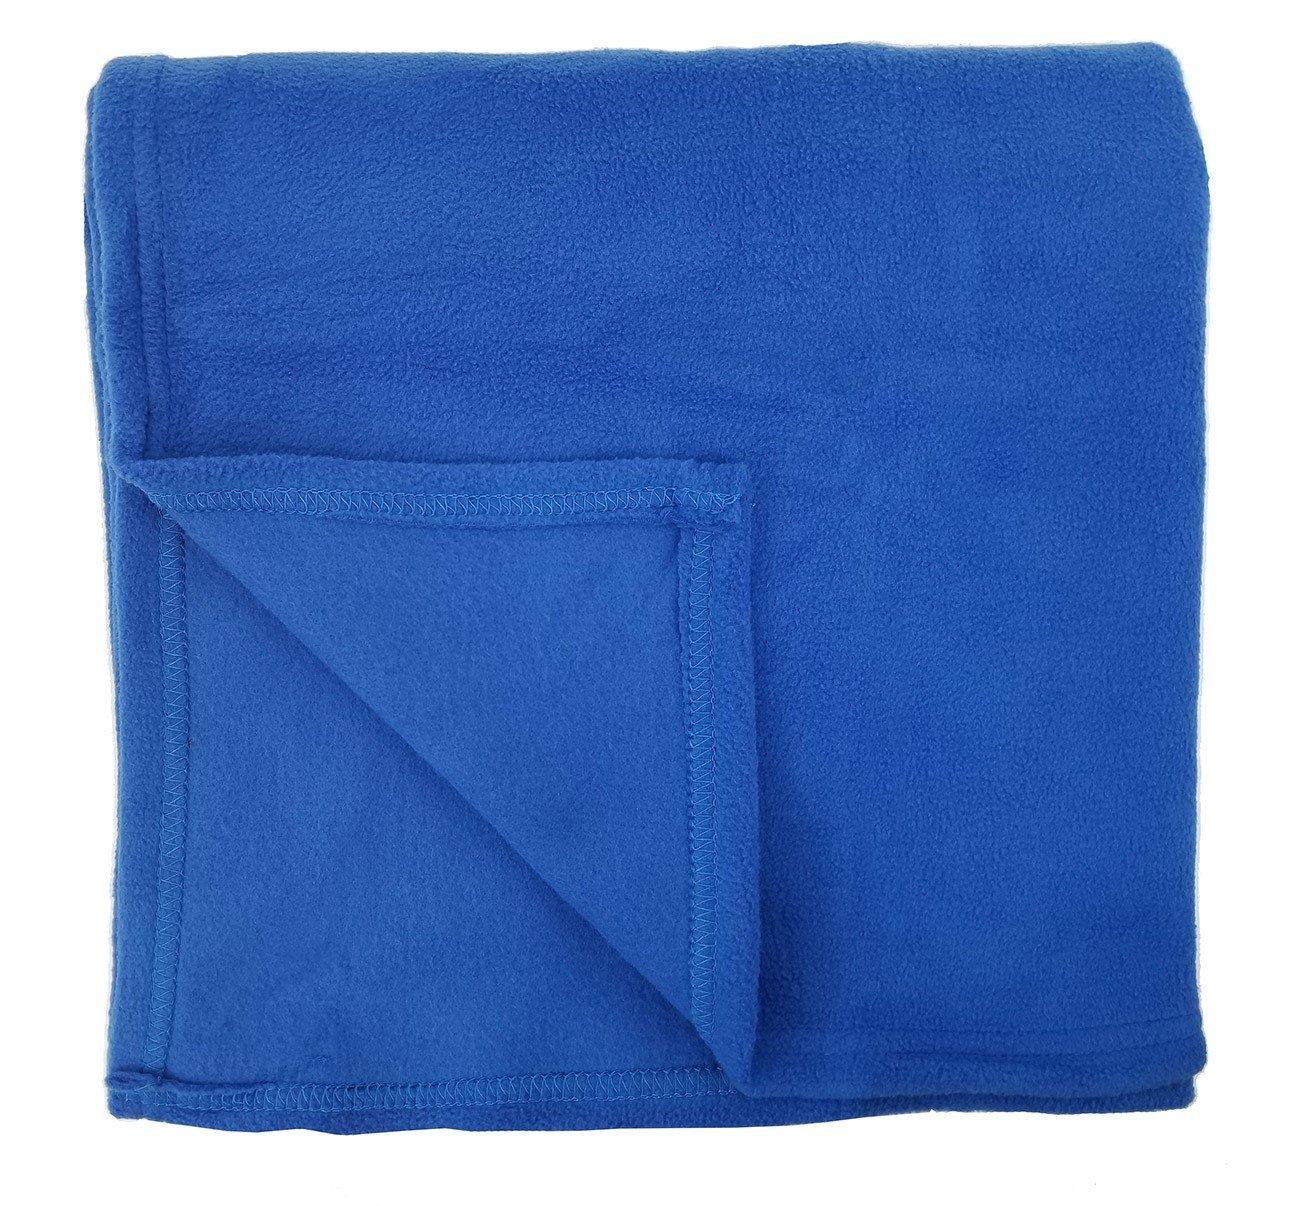 Rollee Pollee Children's Nap Blanket, Super Soft Anti-Pill Fleece Blanket Toddlers Kids, 36'' x 48'' (Blue)